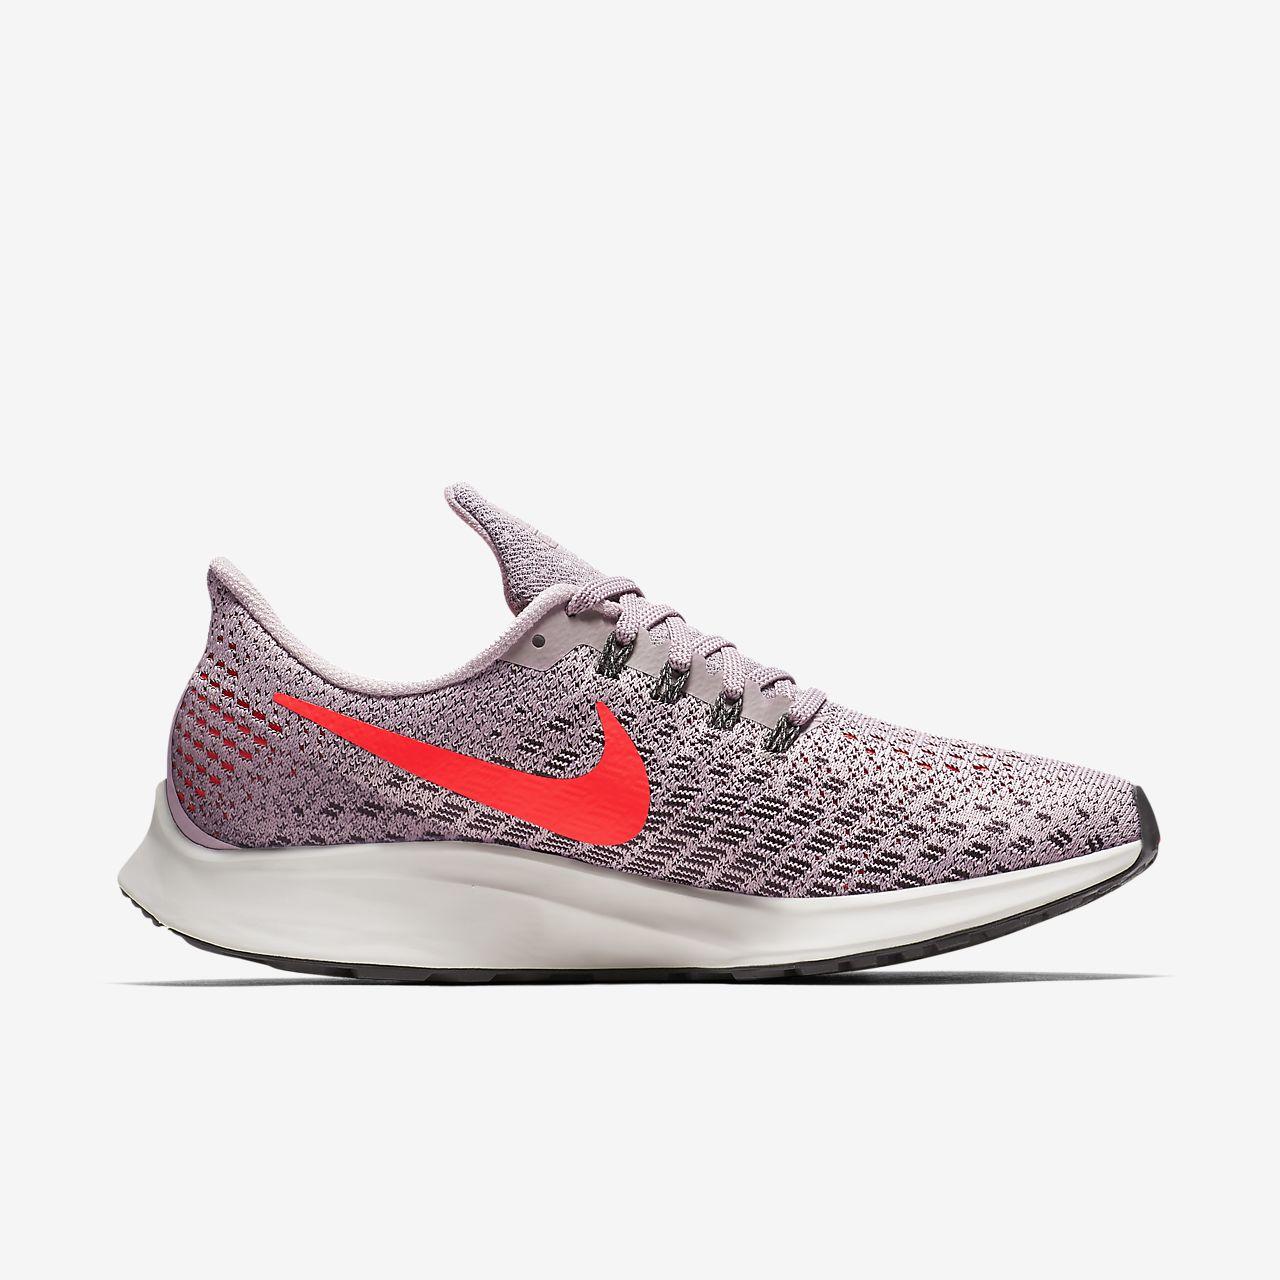 the best attitude 4273a a2fcb ... Nike Air Zoom Pegasus 35 Women s Running Shoe